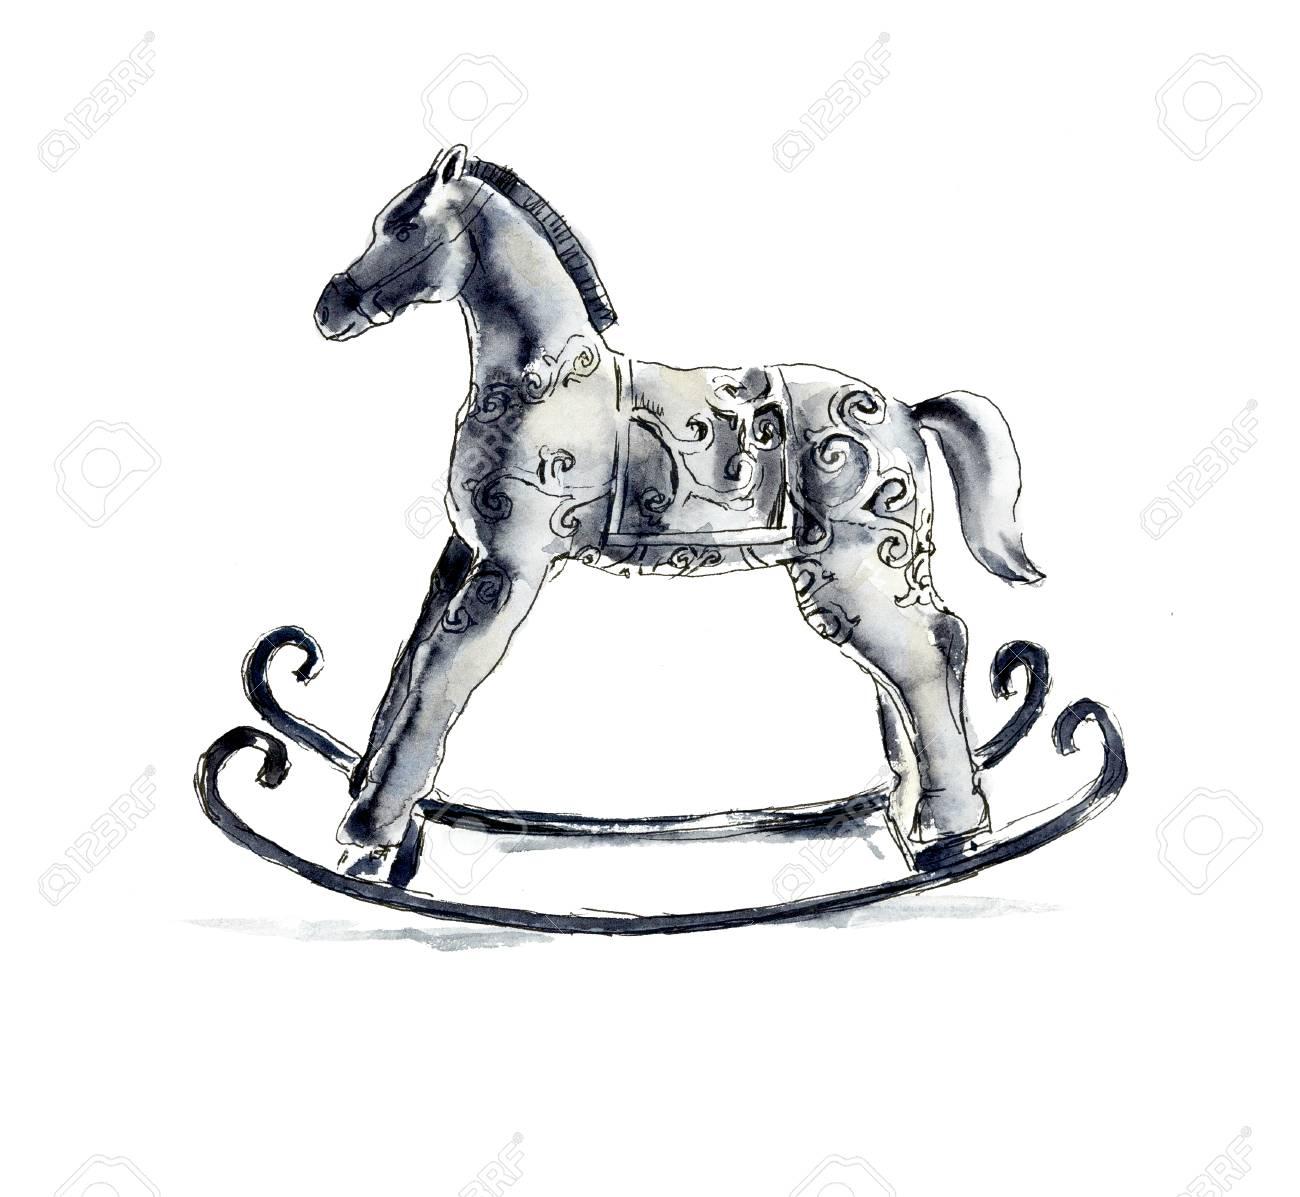 Christmas Horse Drawing.Stock Illustration